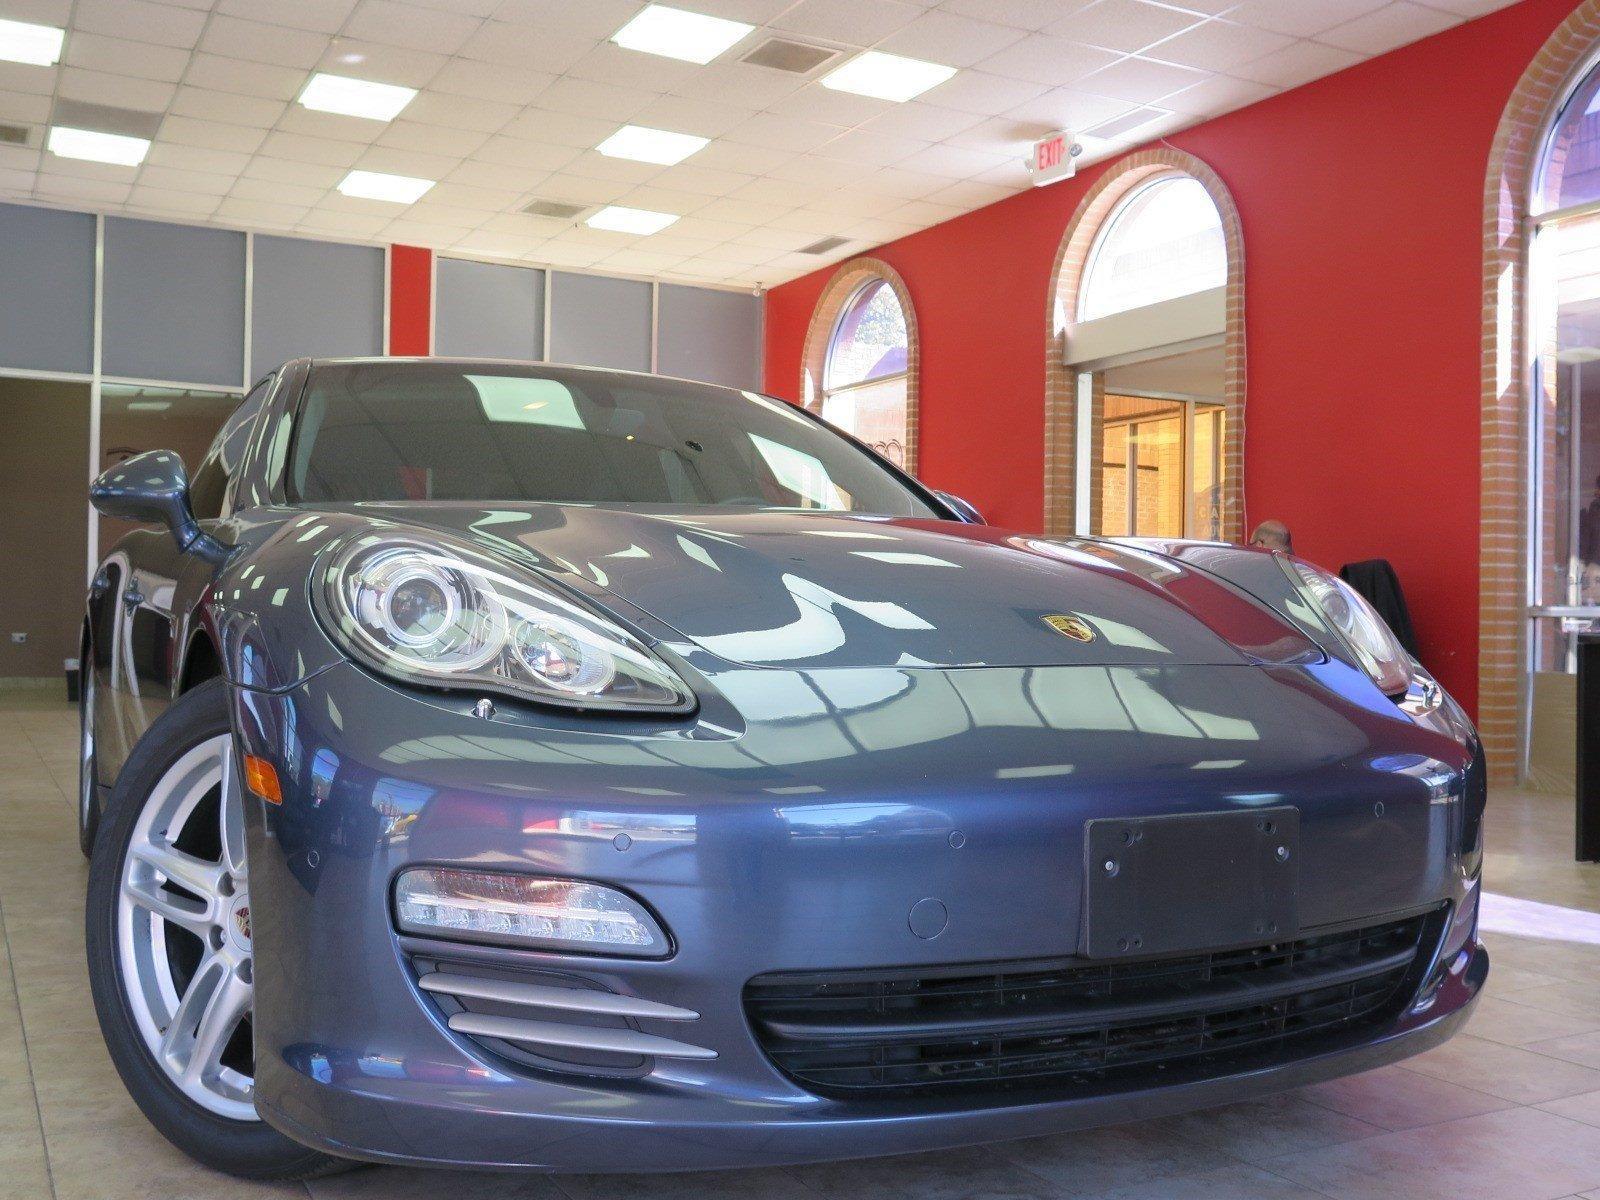 Used 2010 Porsche Panamera 4S for sale Sold at Gravity Autos Atlanta in Chamblee GA 30341 1